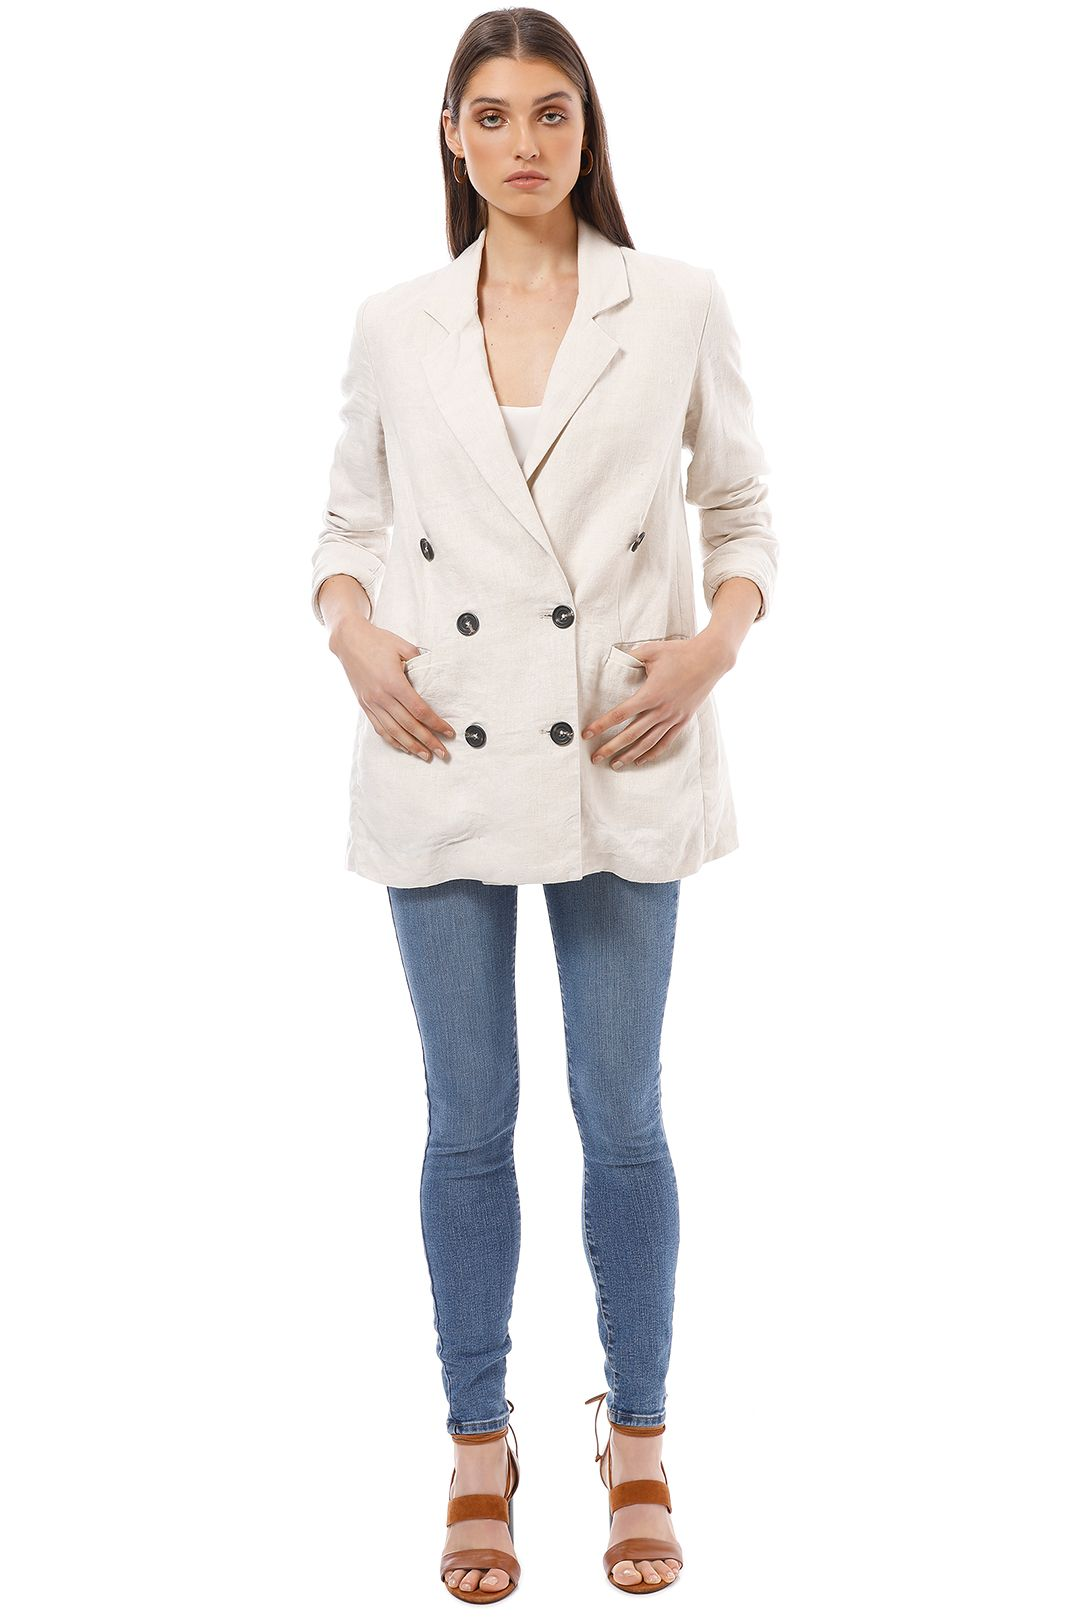 Shona Joy - Atticus Linen Blazer - Natural Cream - Front